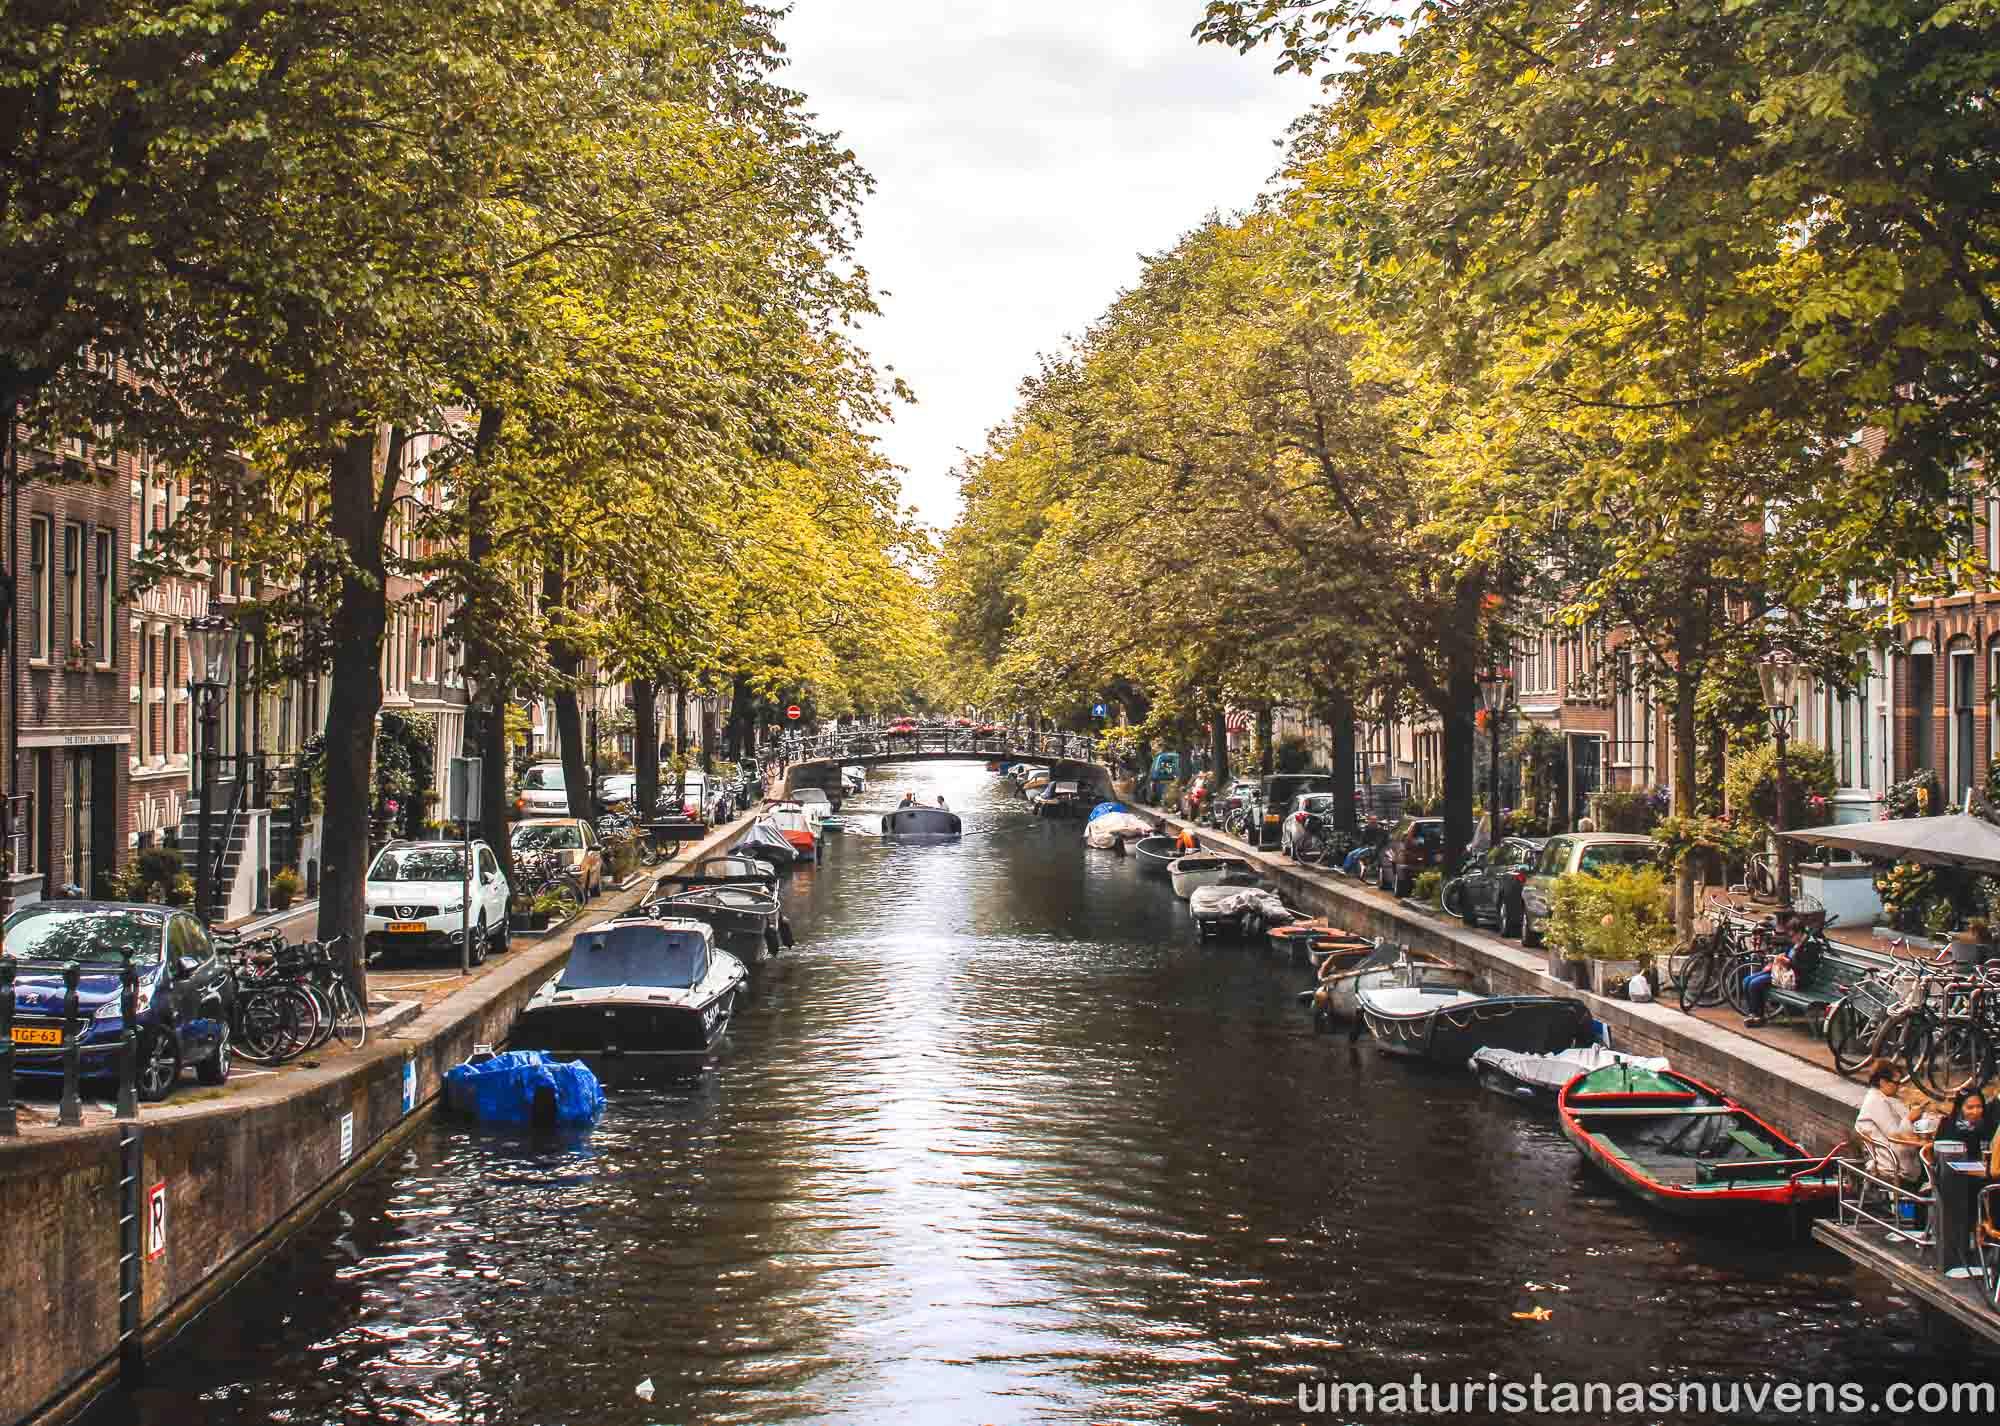 Canal no bairro Jordaan em Amsterdam - Holanda